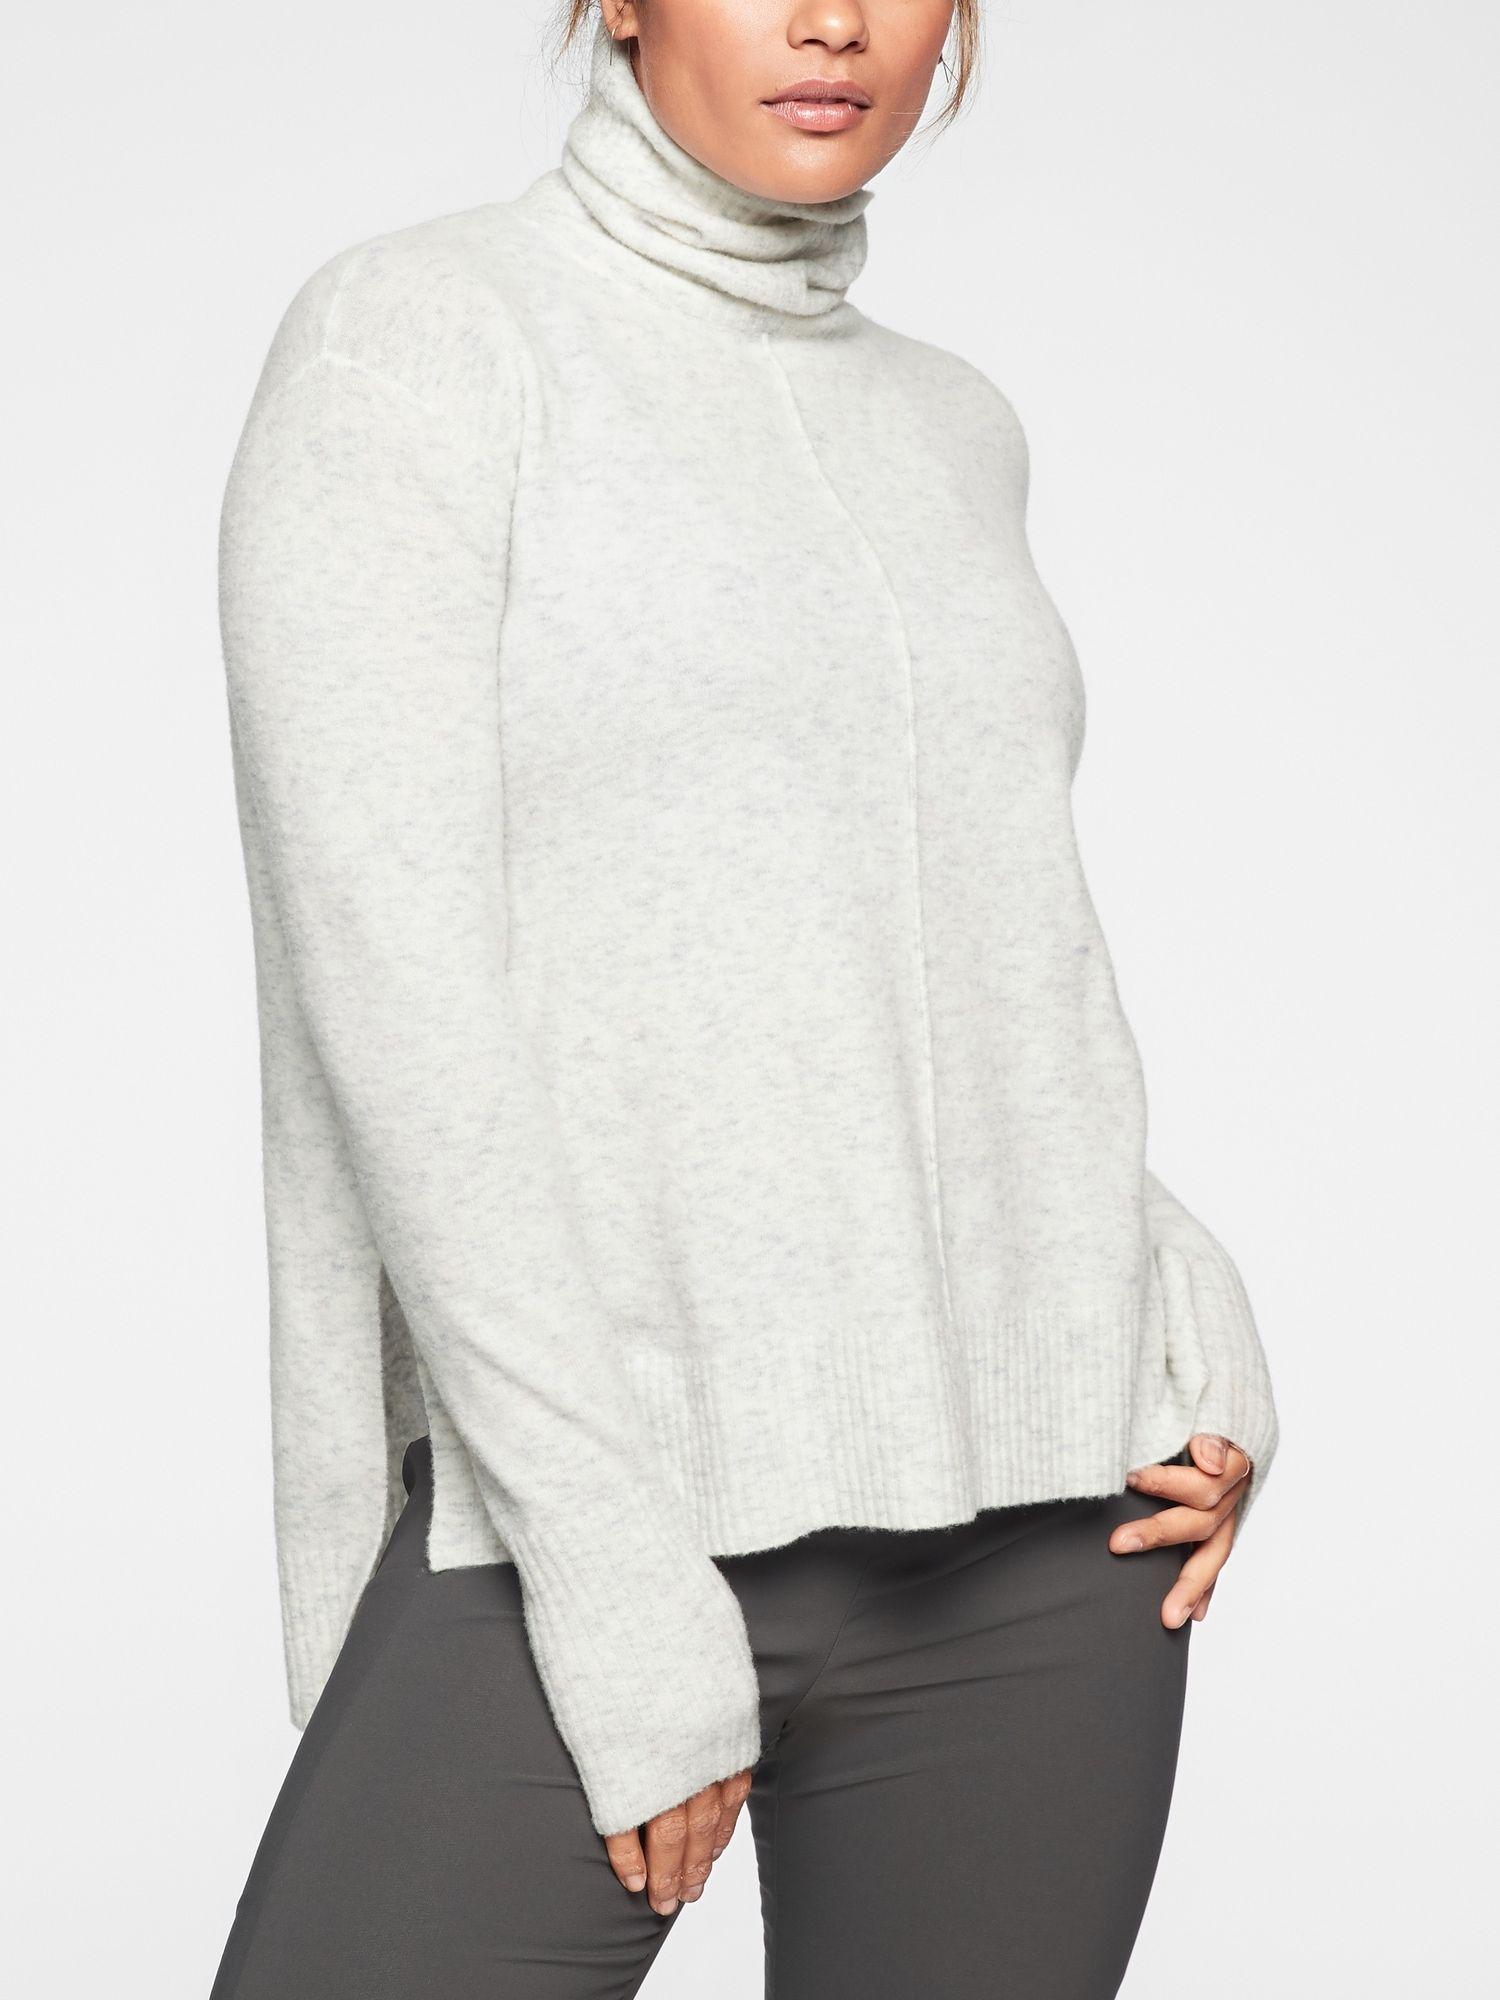 4d875240 Transit Pullover Turtleneck Sweater | Athleta Turtleneck, Stitch Fix,  Pullover, Sleeves, Sweaters